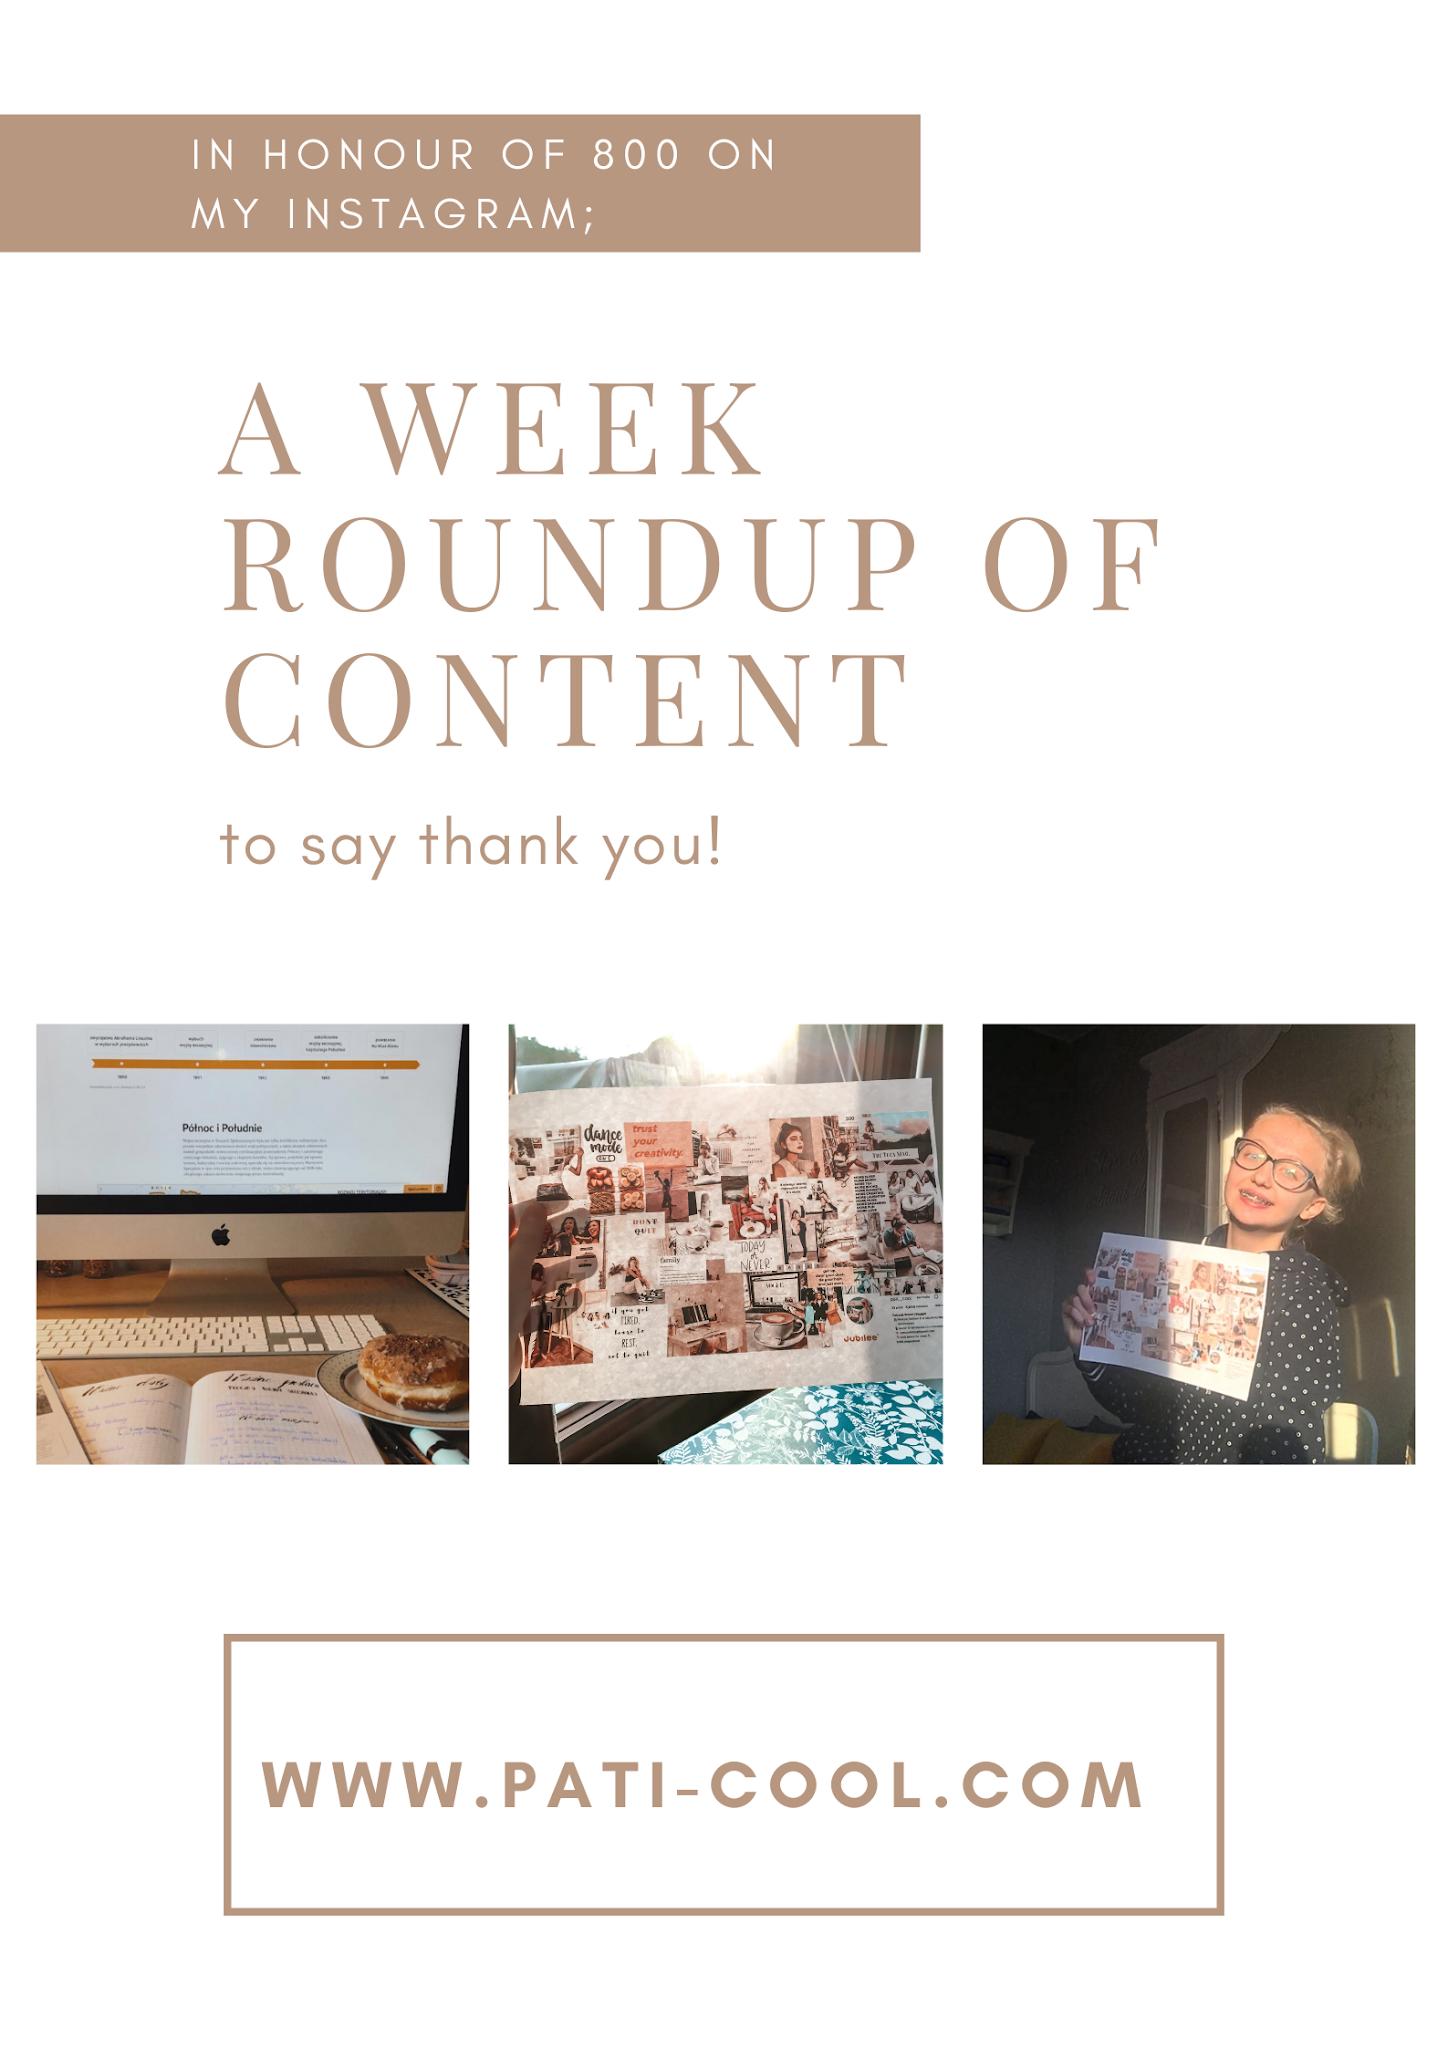 Week of content